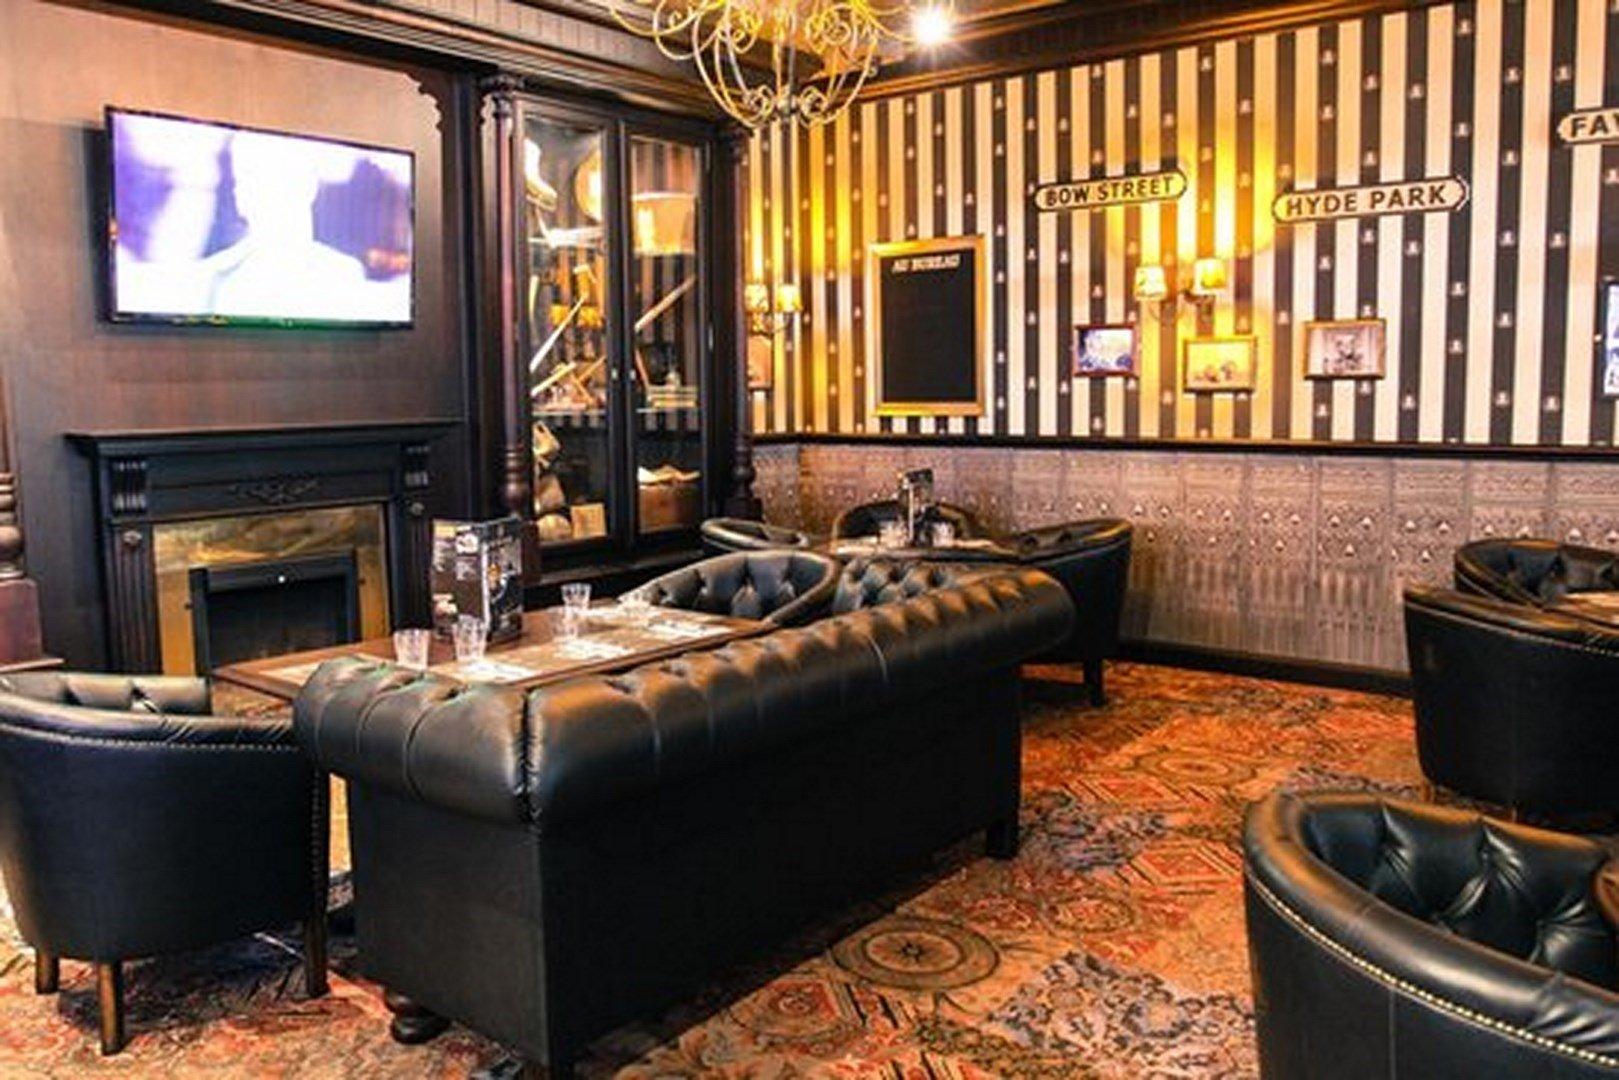 au bureau suresnes restaurant 28 images au bureau suresnes brasserie bistrot 224 suresnes. Black Bedroom Furniture Sets. Home Design Ideas